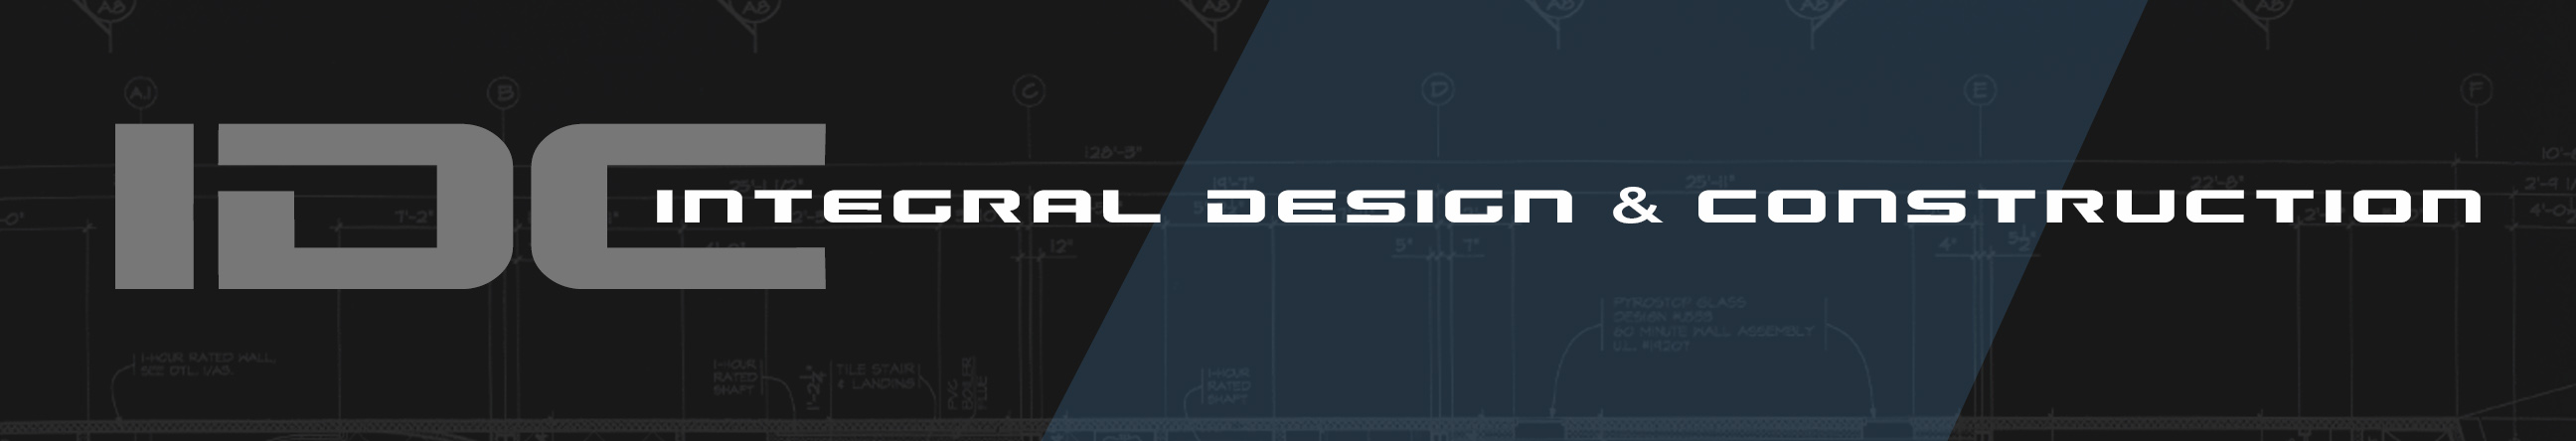 Integral Design & Construction in Ventura, California